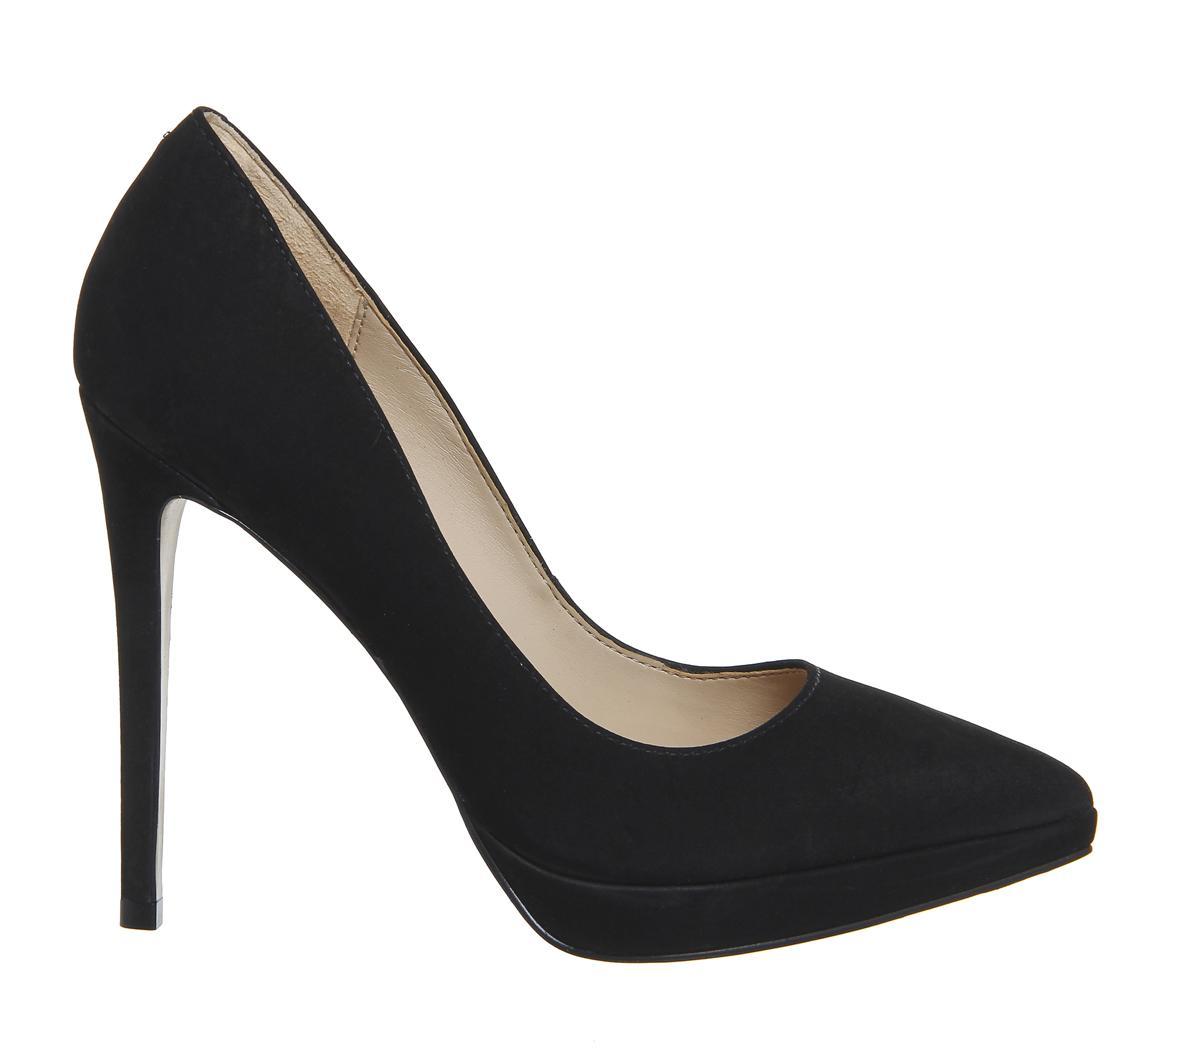 office naples platform court heels in black lyst